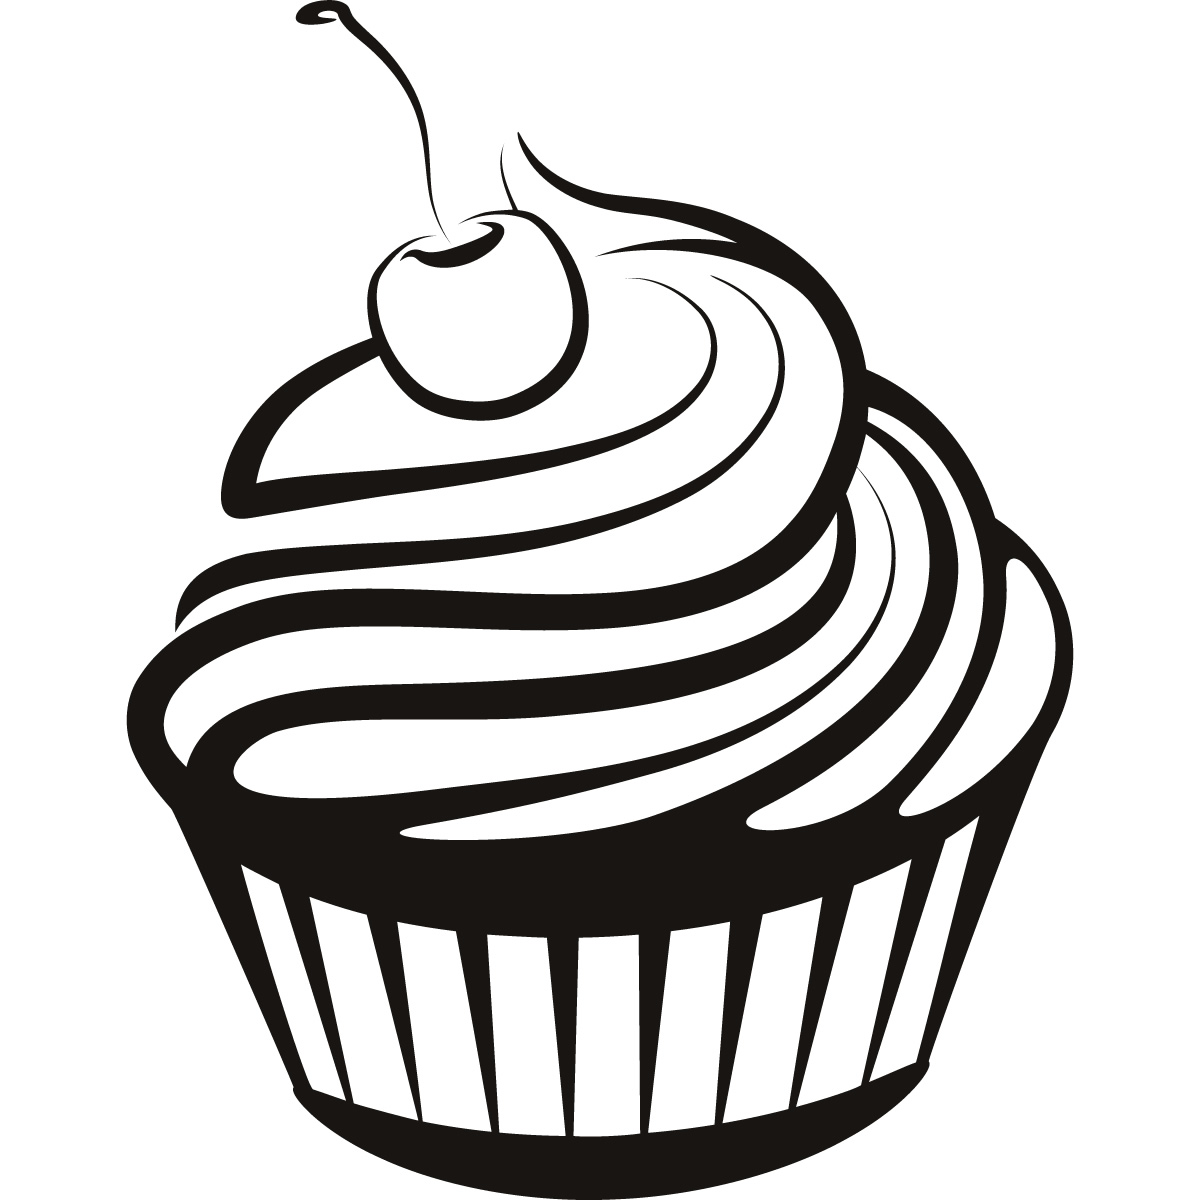 Cupcake black and white cupcake drawings-Cupcake black and white cupcake drawings and cupcakes clipart-16